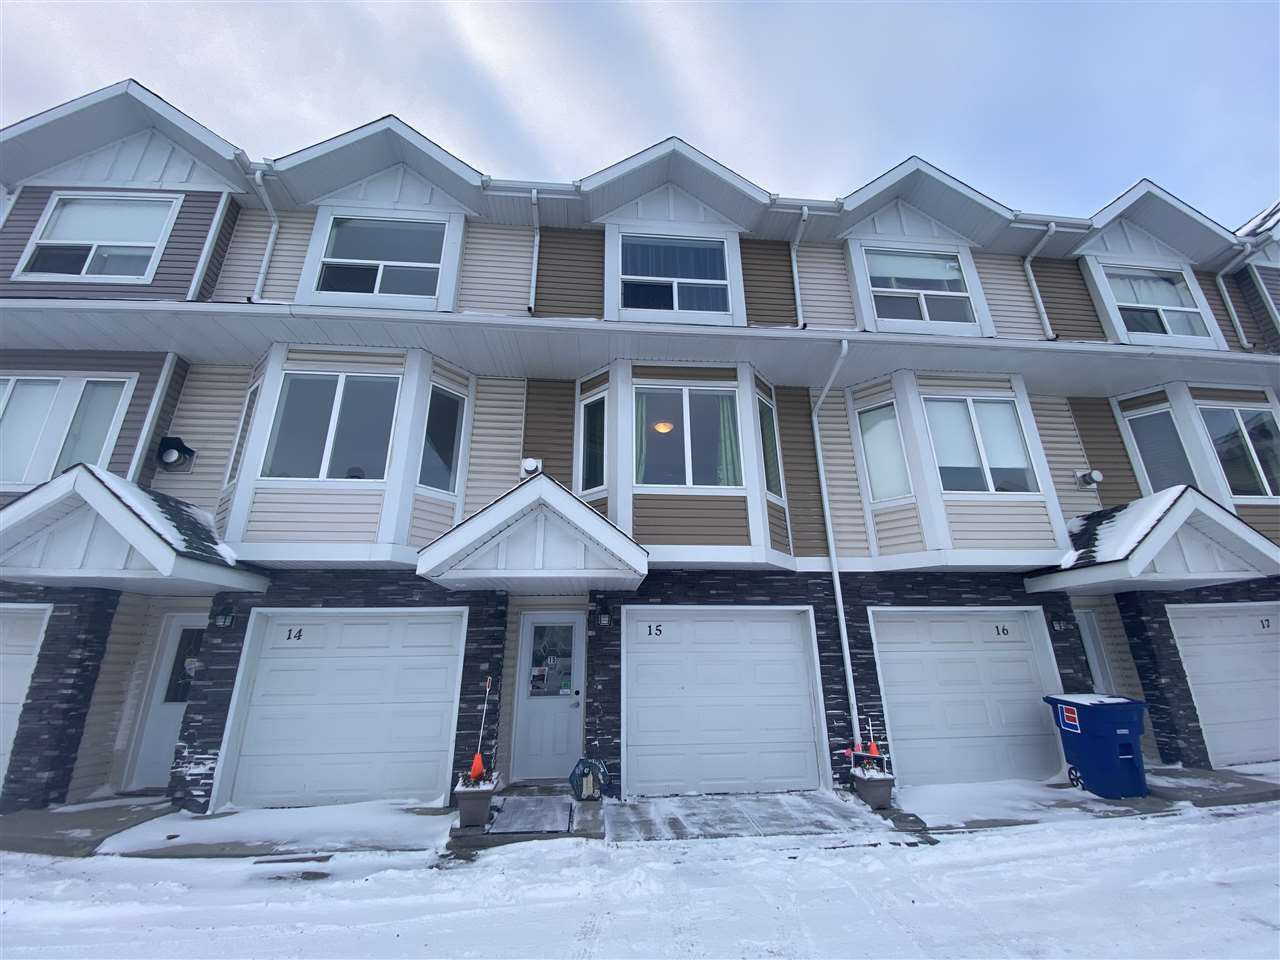 Main Photo: 15 13215 153 Avenue in Edmonton: Zone 27 Townhouse for sale : MLS®# E4220487